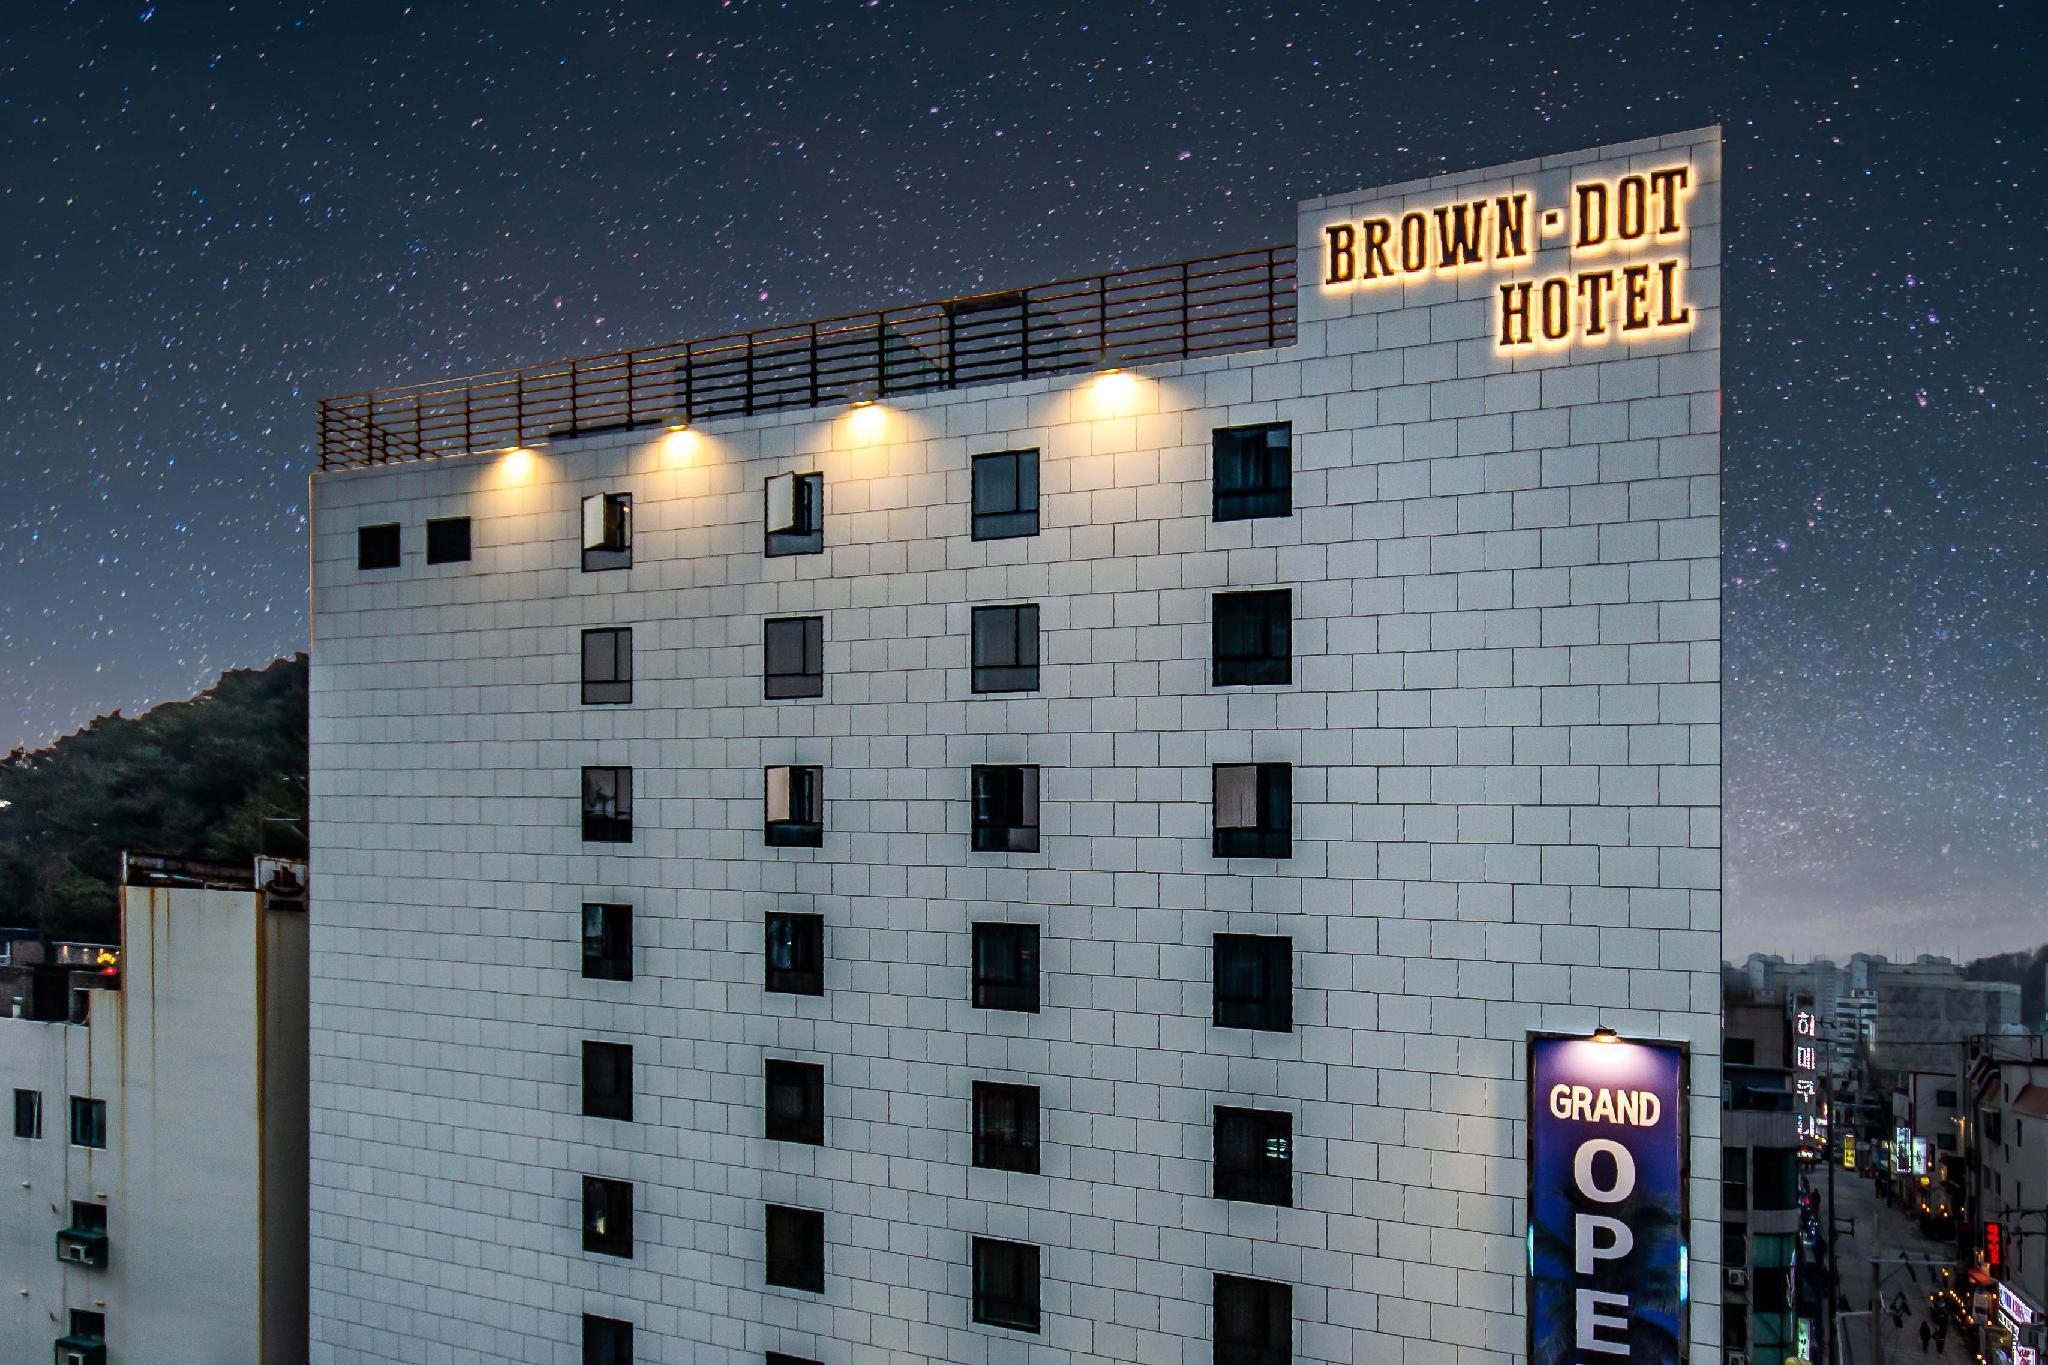 Brown Dot Hotel Hadan